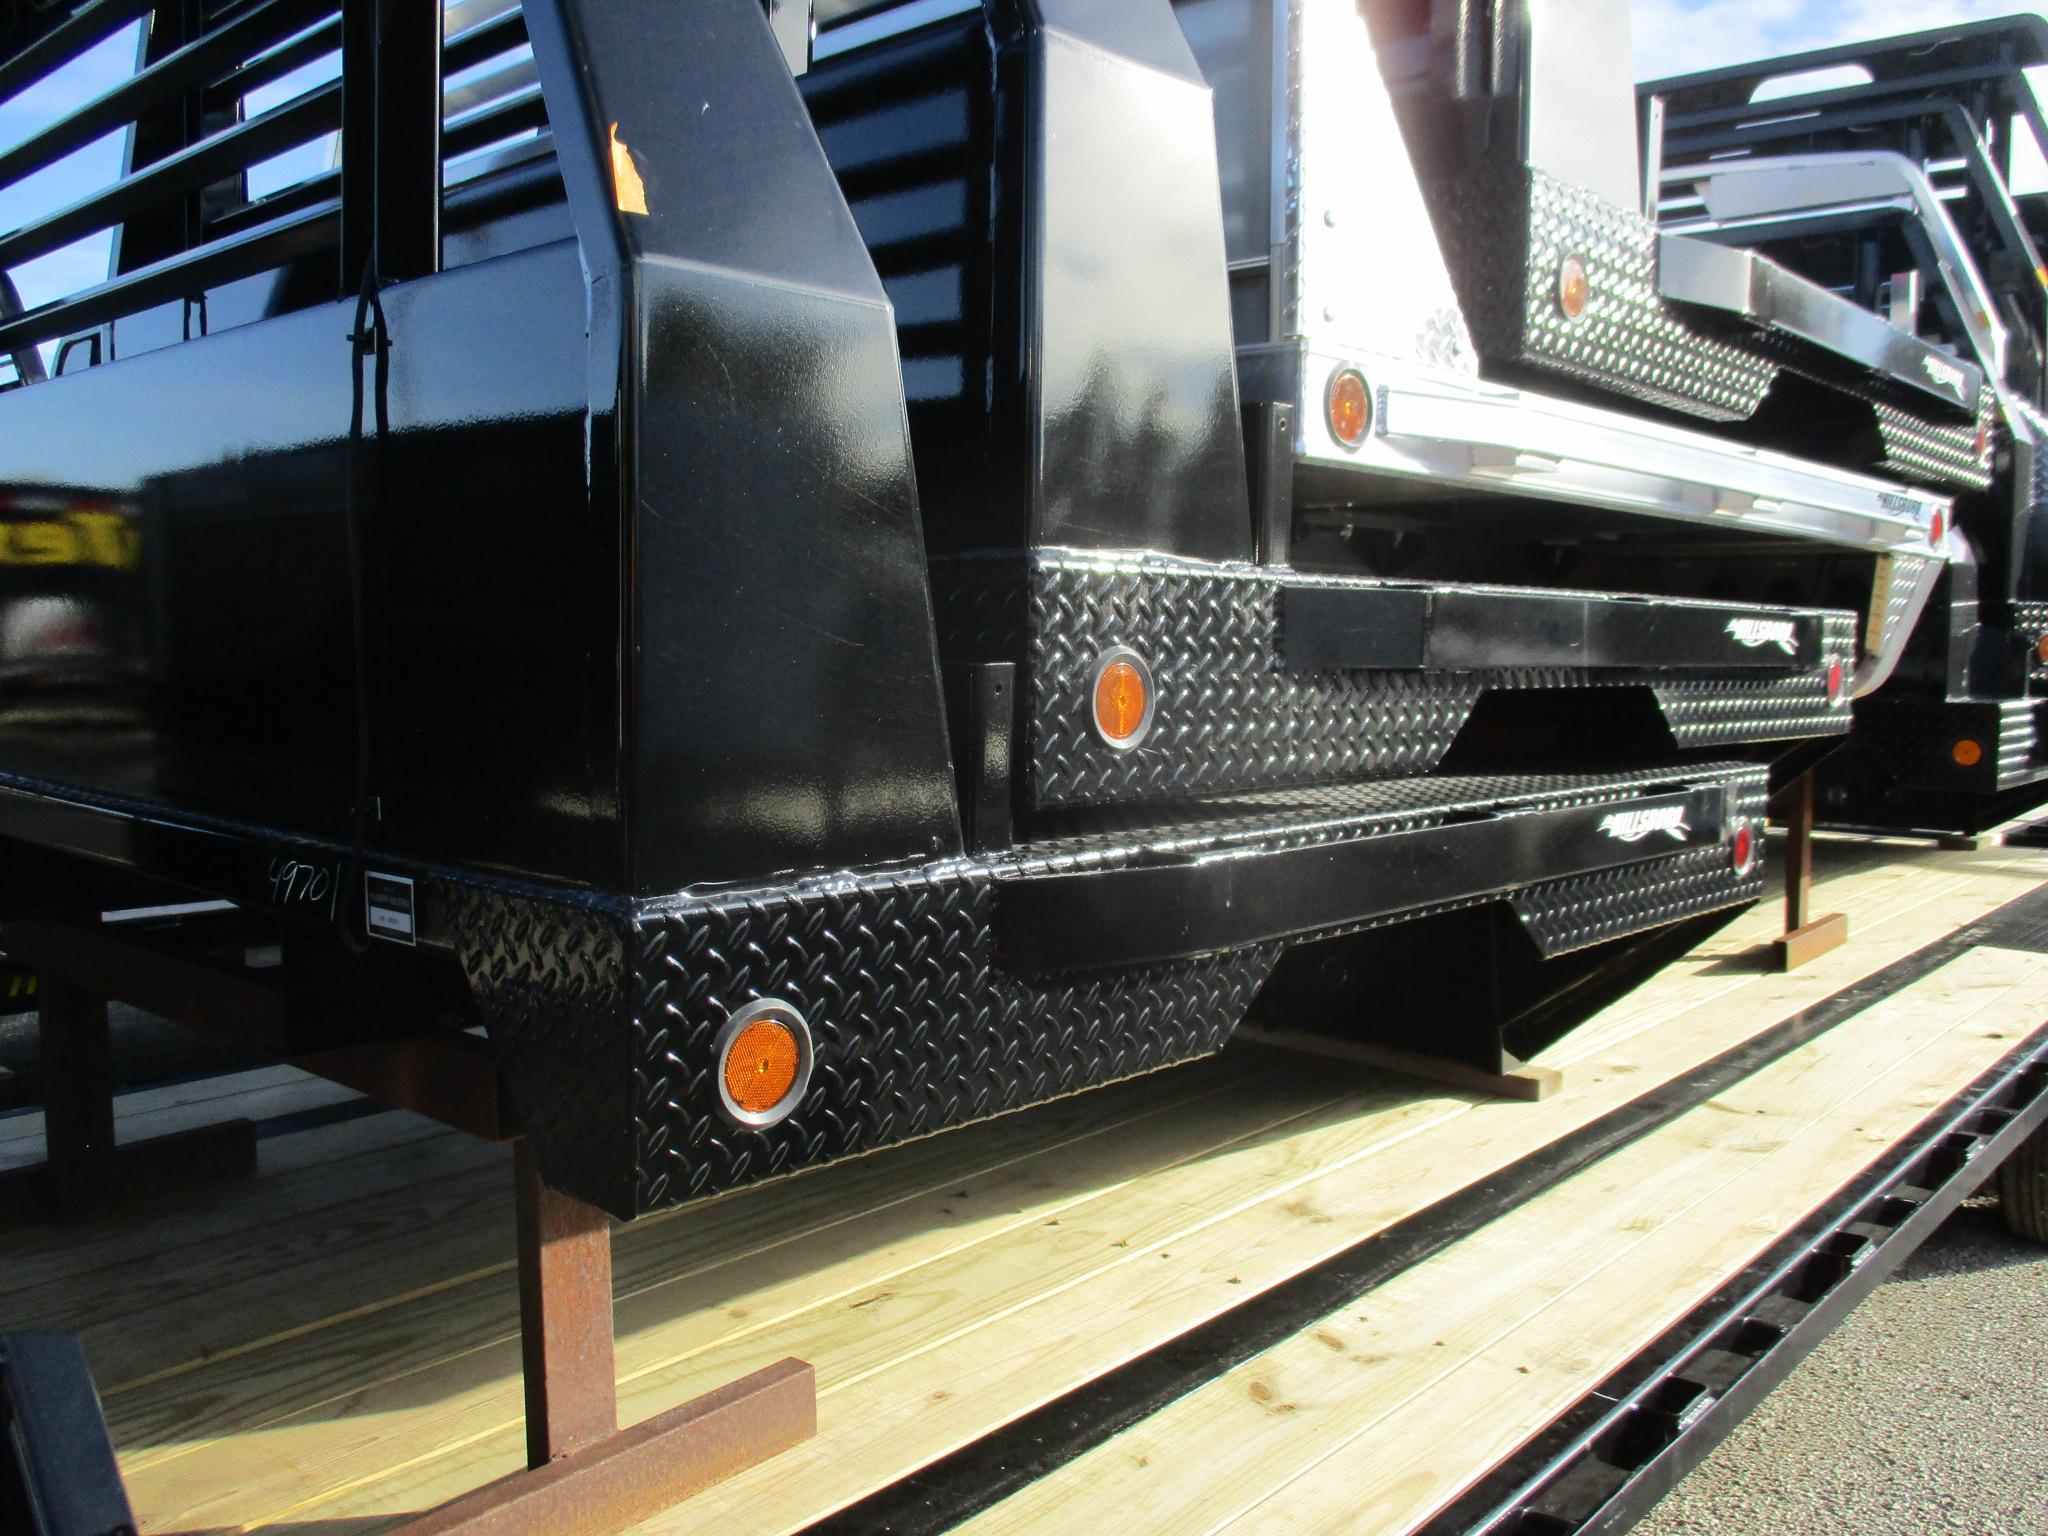 NOS Hillsboro 7 x 80 GI Flatbed Truck Bed